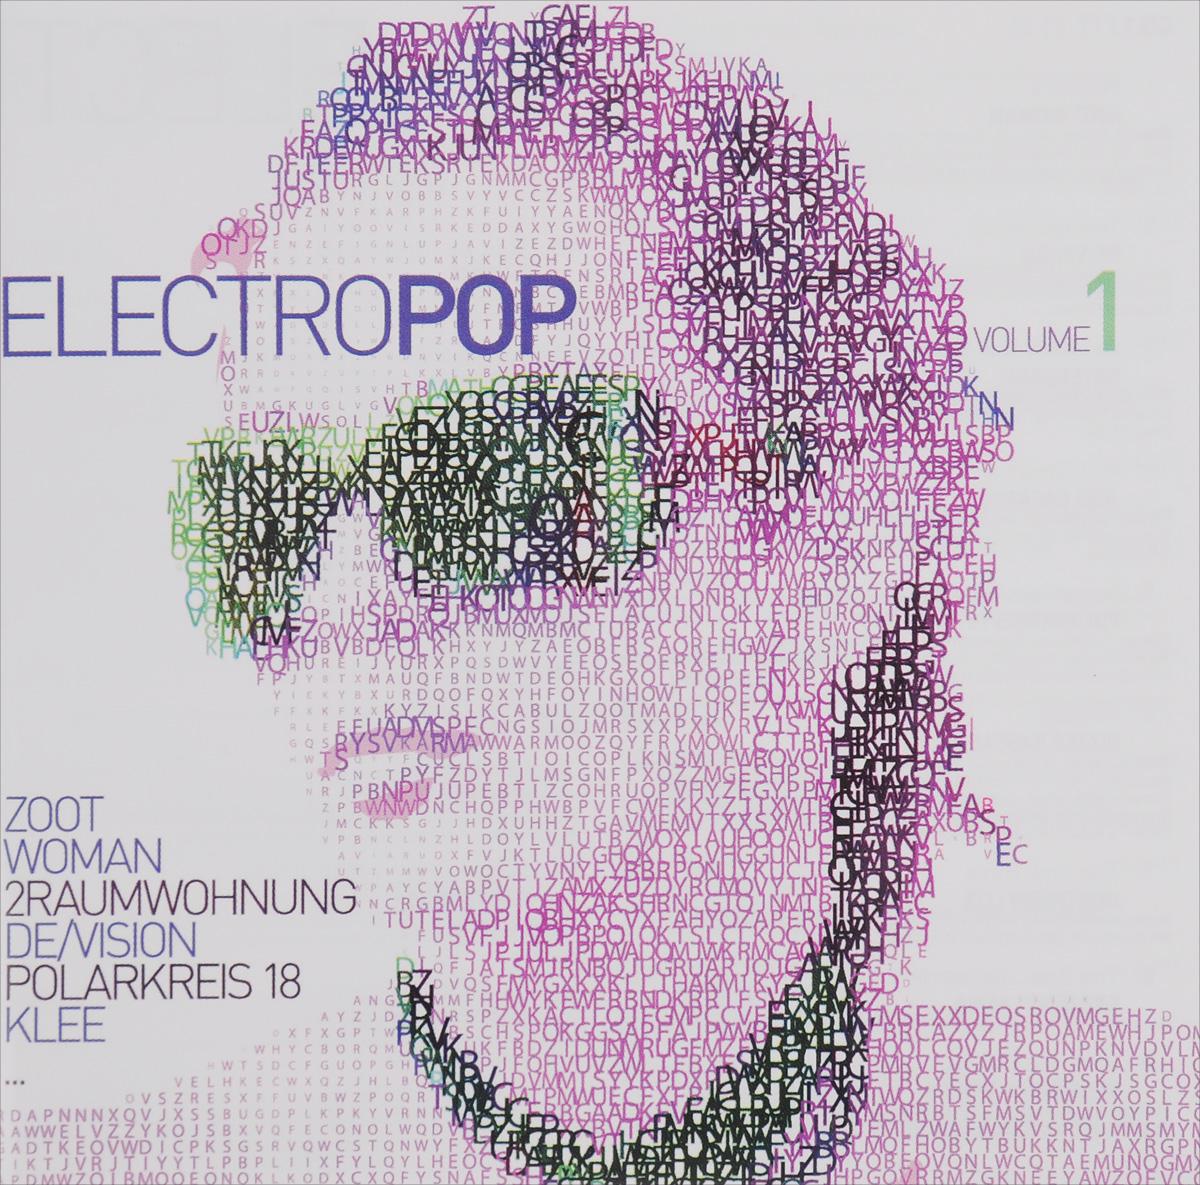 Zoot Woman,De/Vision,Rotersand,Juri Gagarin,Polarkreis 18,Диззи Раскал,Northern Lite,Frozen Plasma,Frittenbude,Supershirt,2raumwohnung,Klee,Сара Нокс,Spillsbury,P24,Петер Лихт,Helalyn Flowers,Bodi Bill,Chapeau Claque,Lyronian Electro Pop Vol. 1 (2 CD) electro voice electro voice tx1181